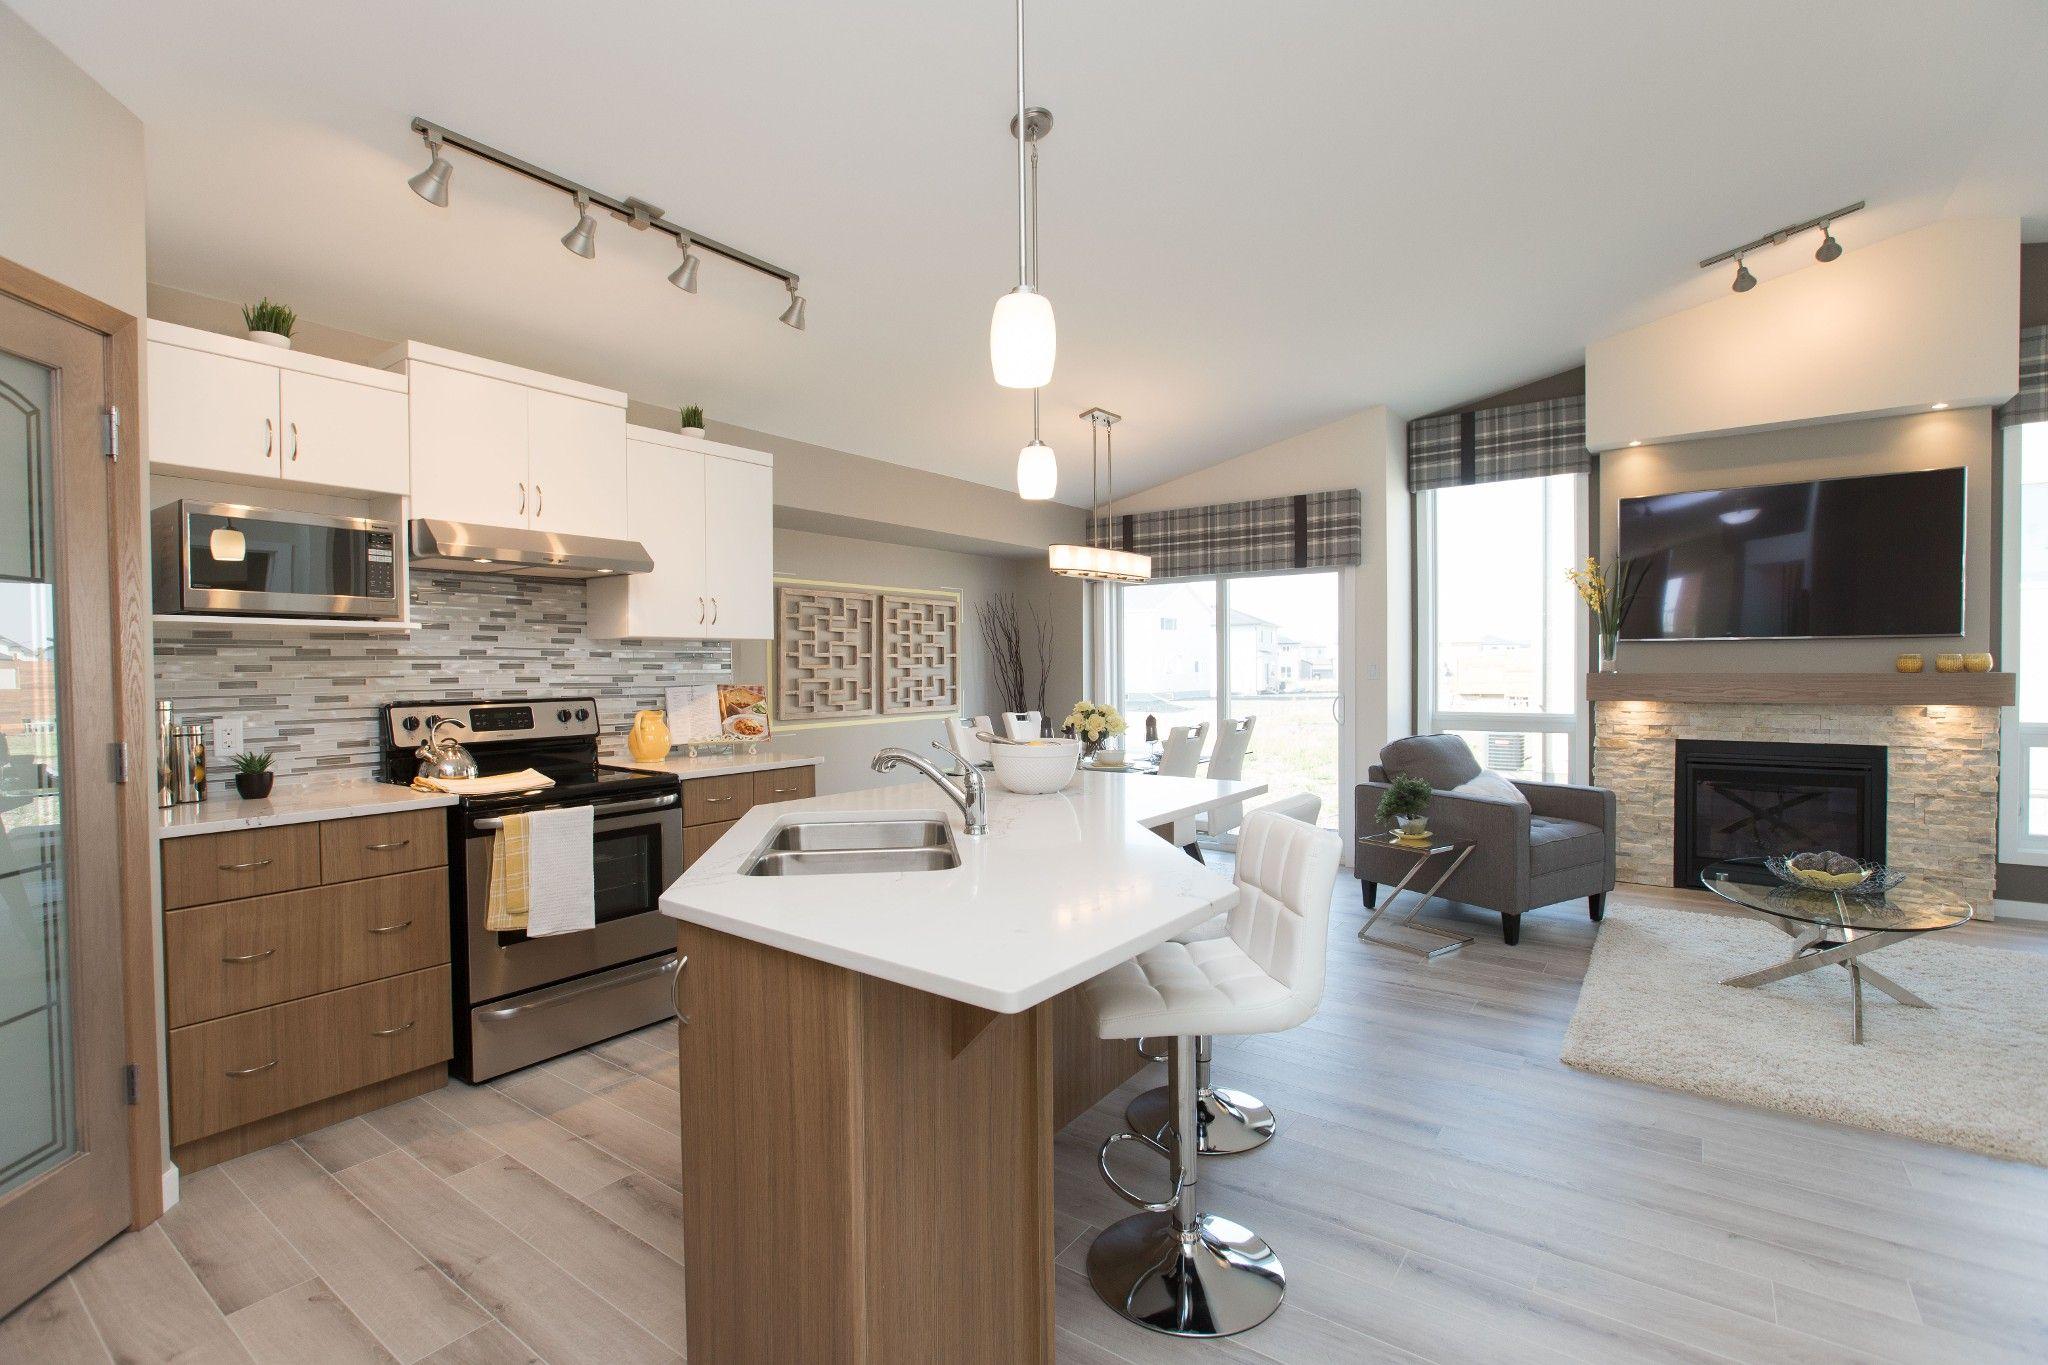 Main Photo: 11 Spillett Cove in Winnipeg: Charleswood Single Family Detached for sale (1H)